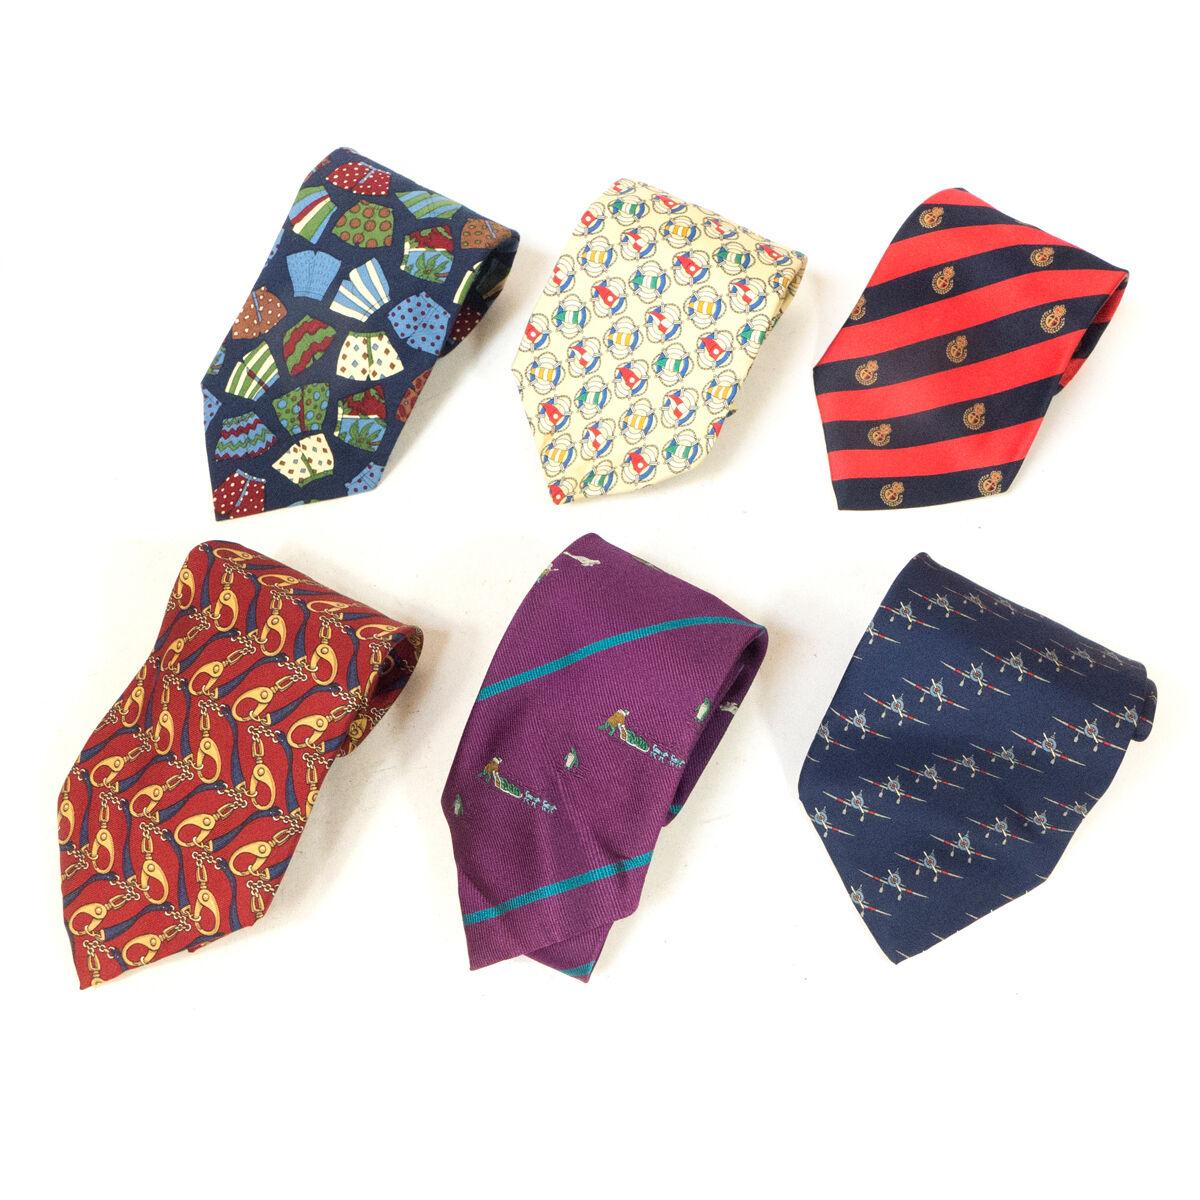 #01 Mixed Lot of 6 Vintage Men's Dresswear Red, Blue, Pale Patterned, etc Ties